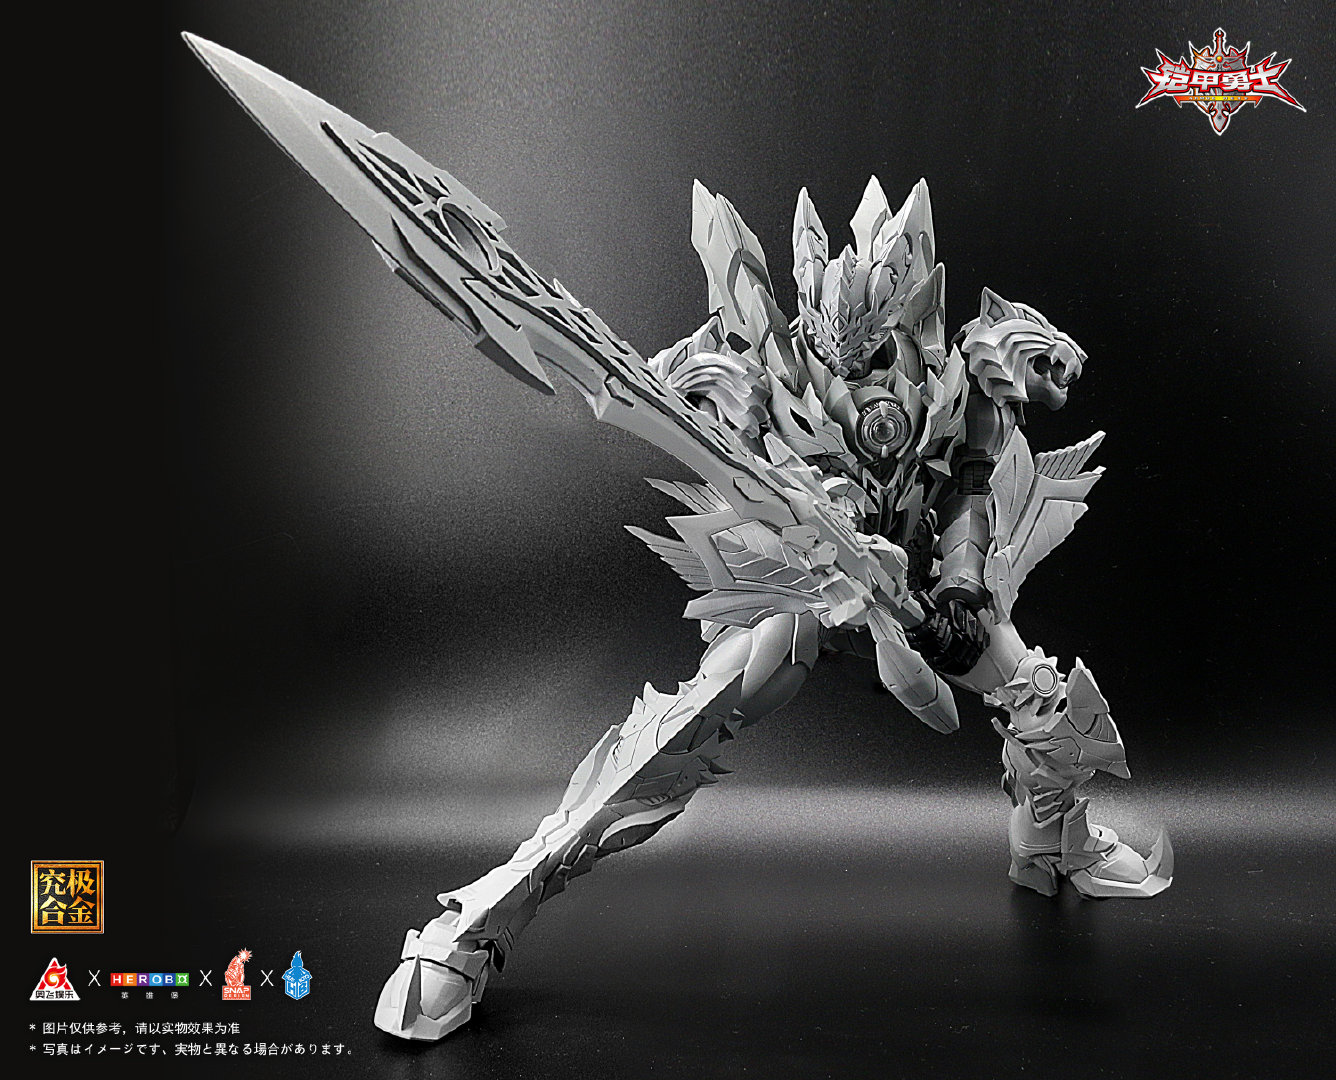 S535_Armor_hero_Emperor_013.jpg